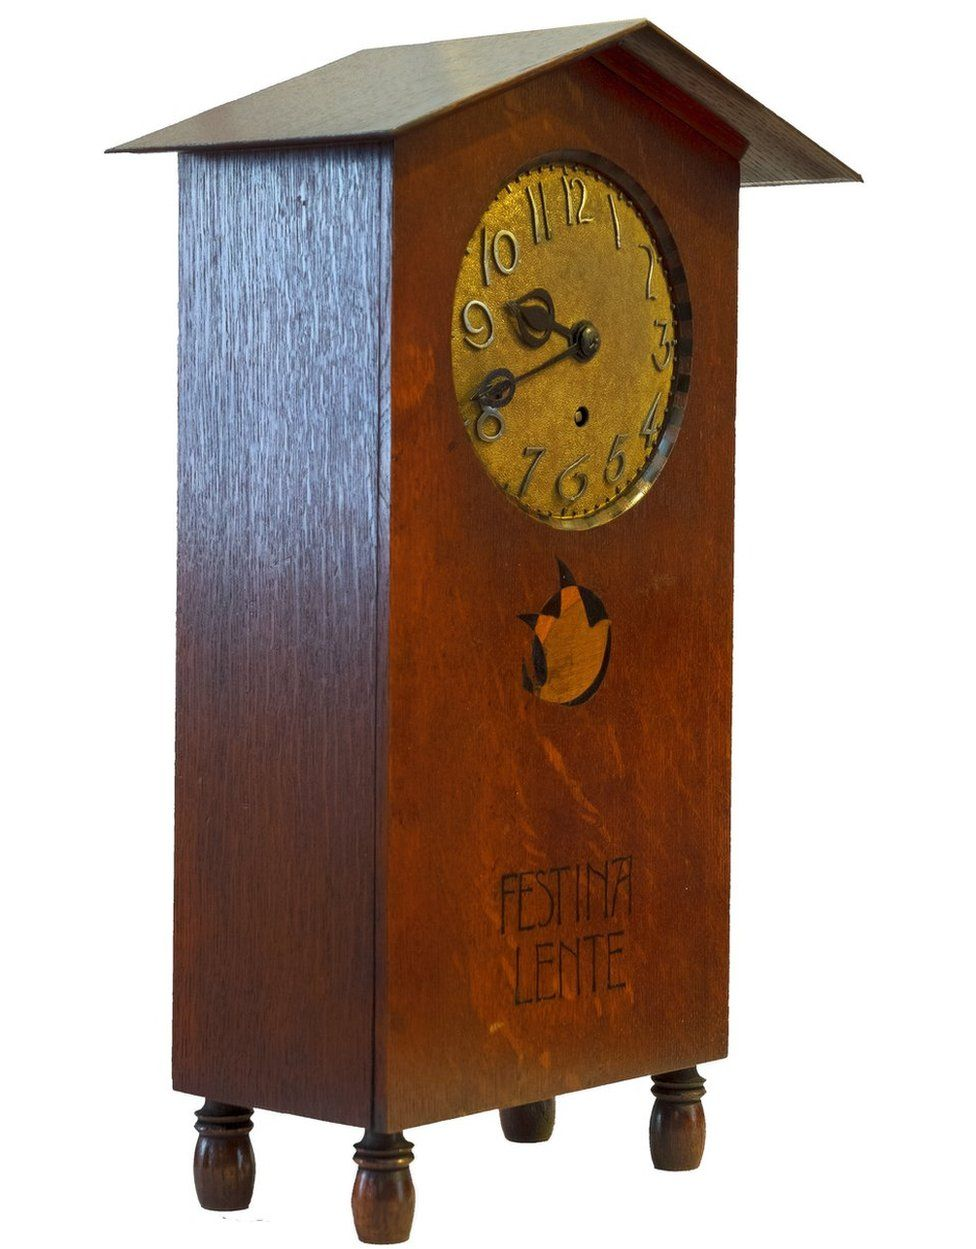 The Pyghtle Clock